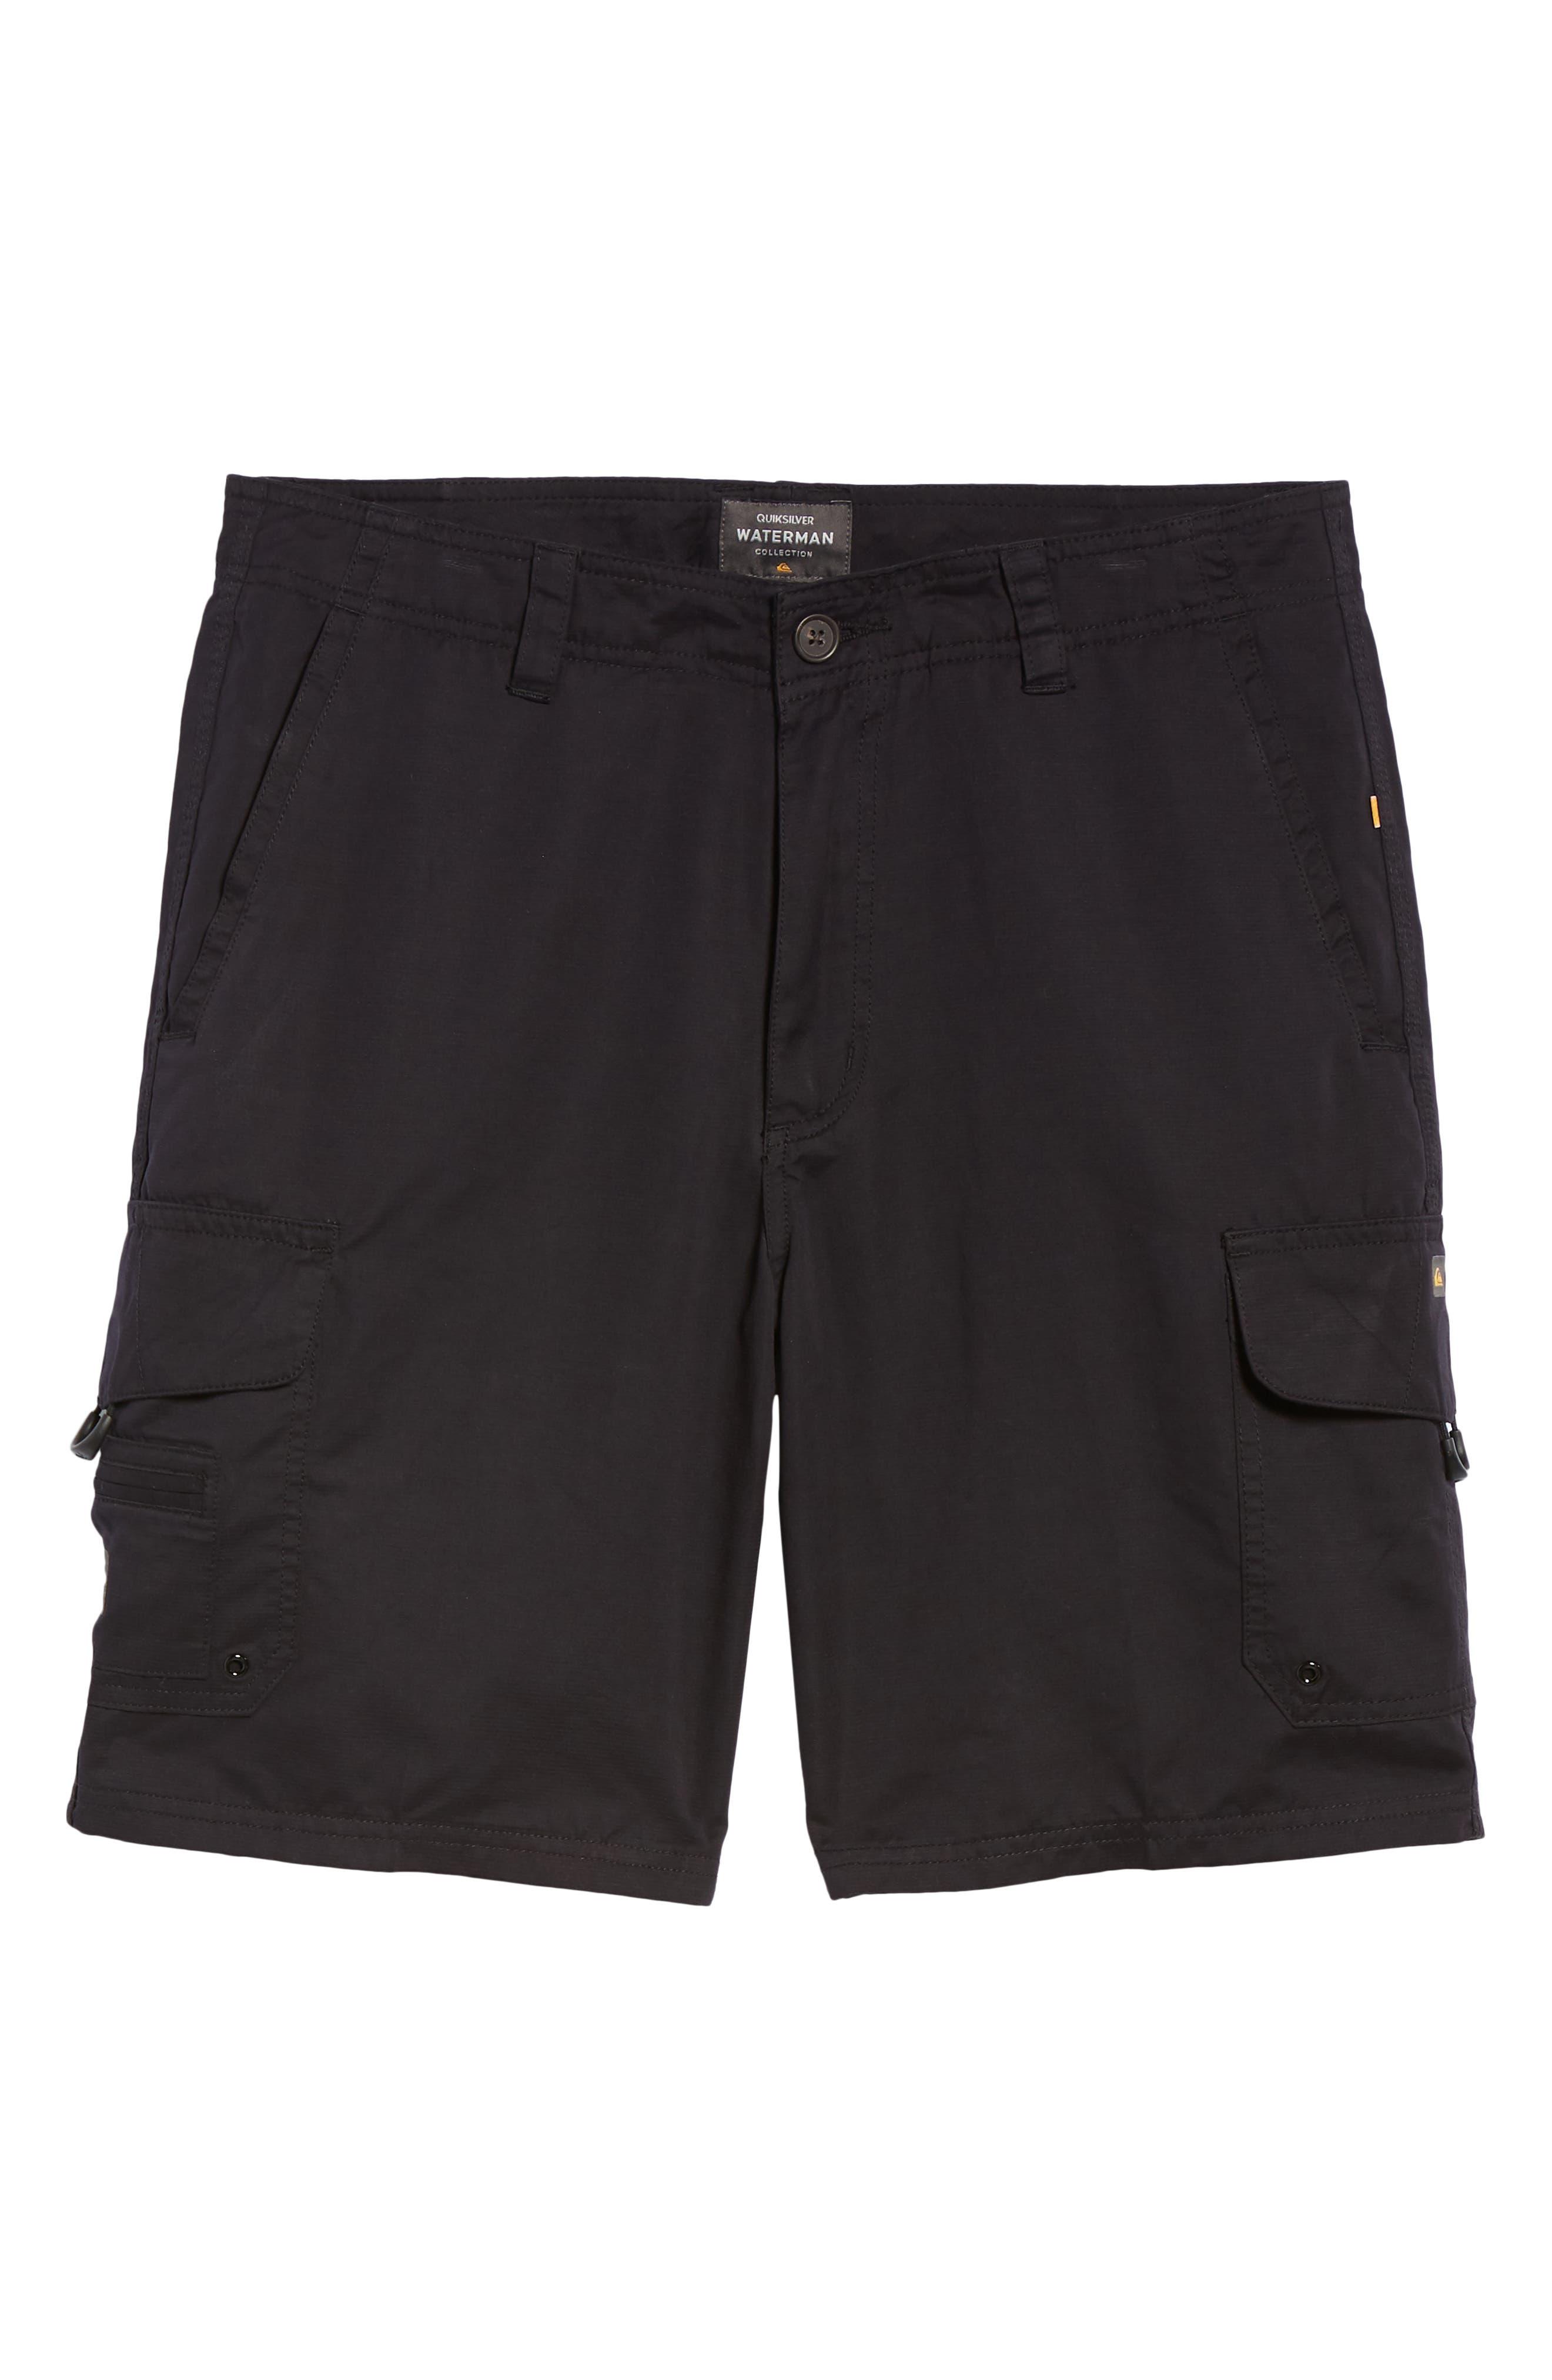 QUIKSILVER WATERMAN COLLECTION, Maldive Regular Fit Cargo Shorts, Alternate thumbnail 6, color, 001